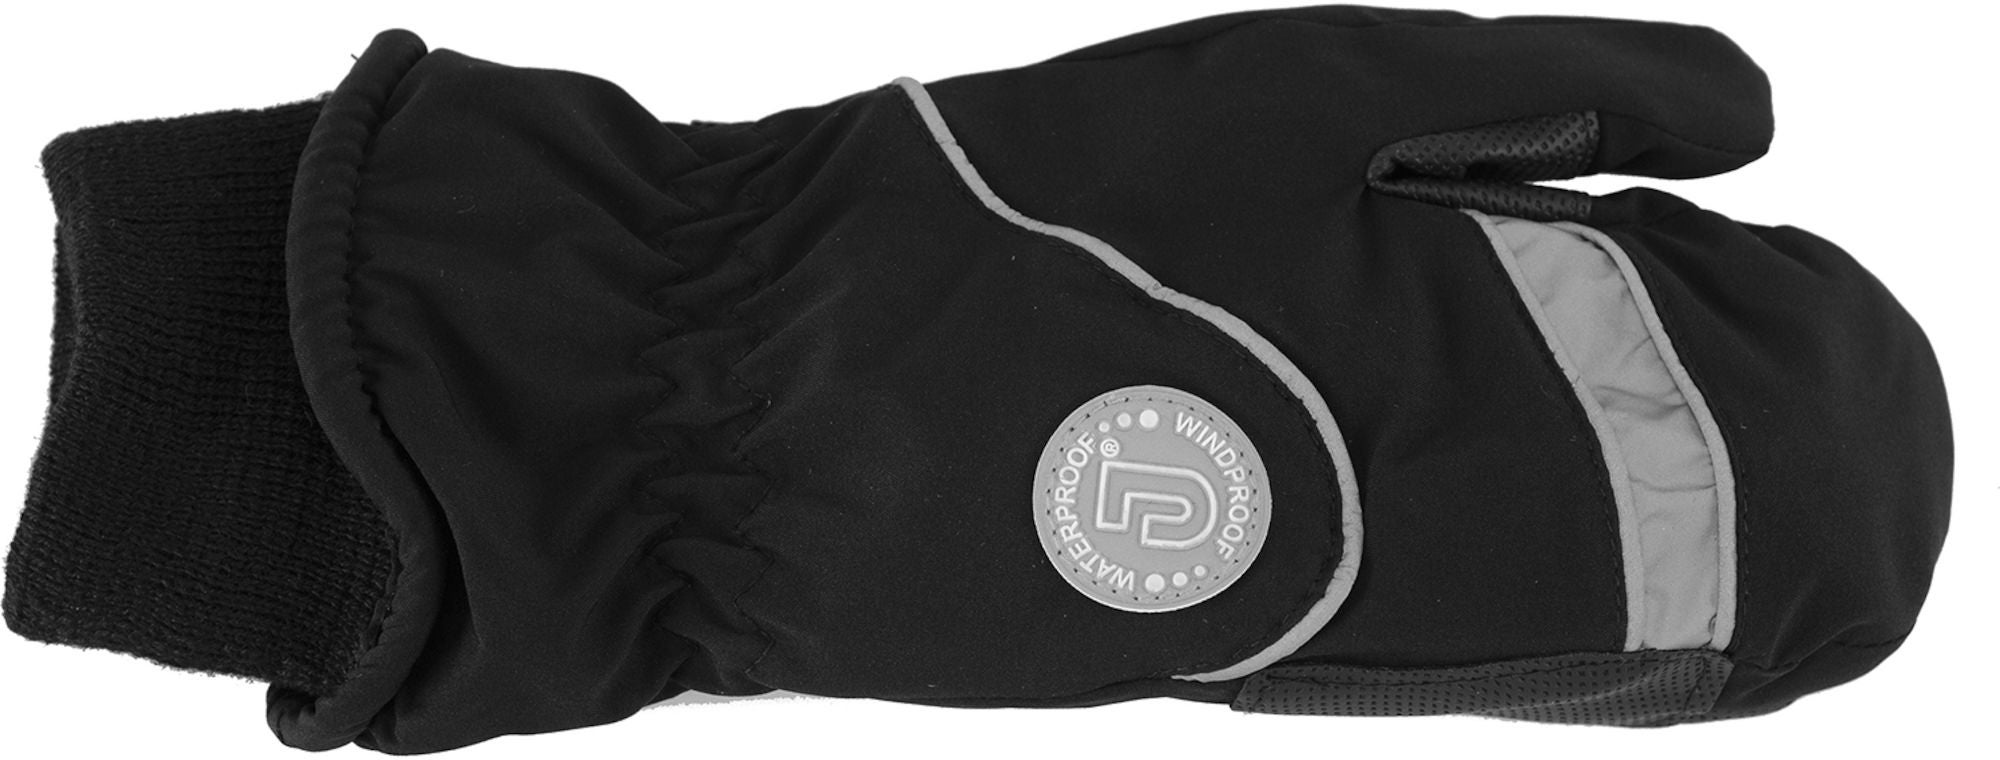 Jacson Thermohandske 3-Finger Reflex, Svart 160